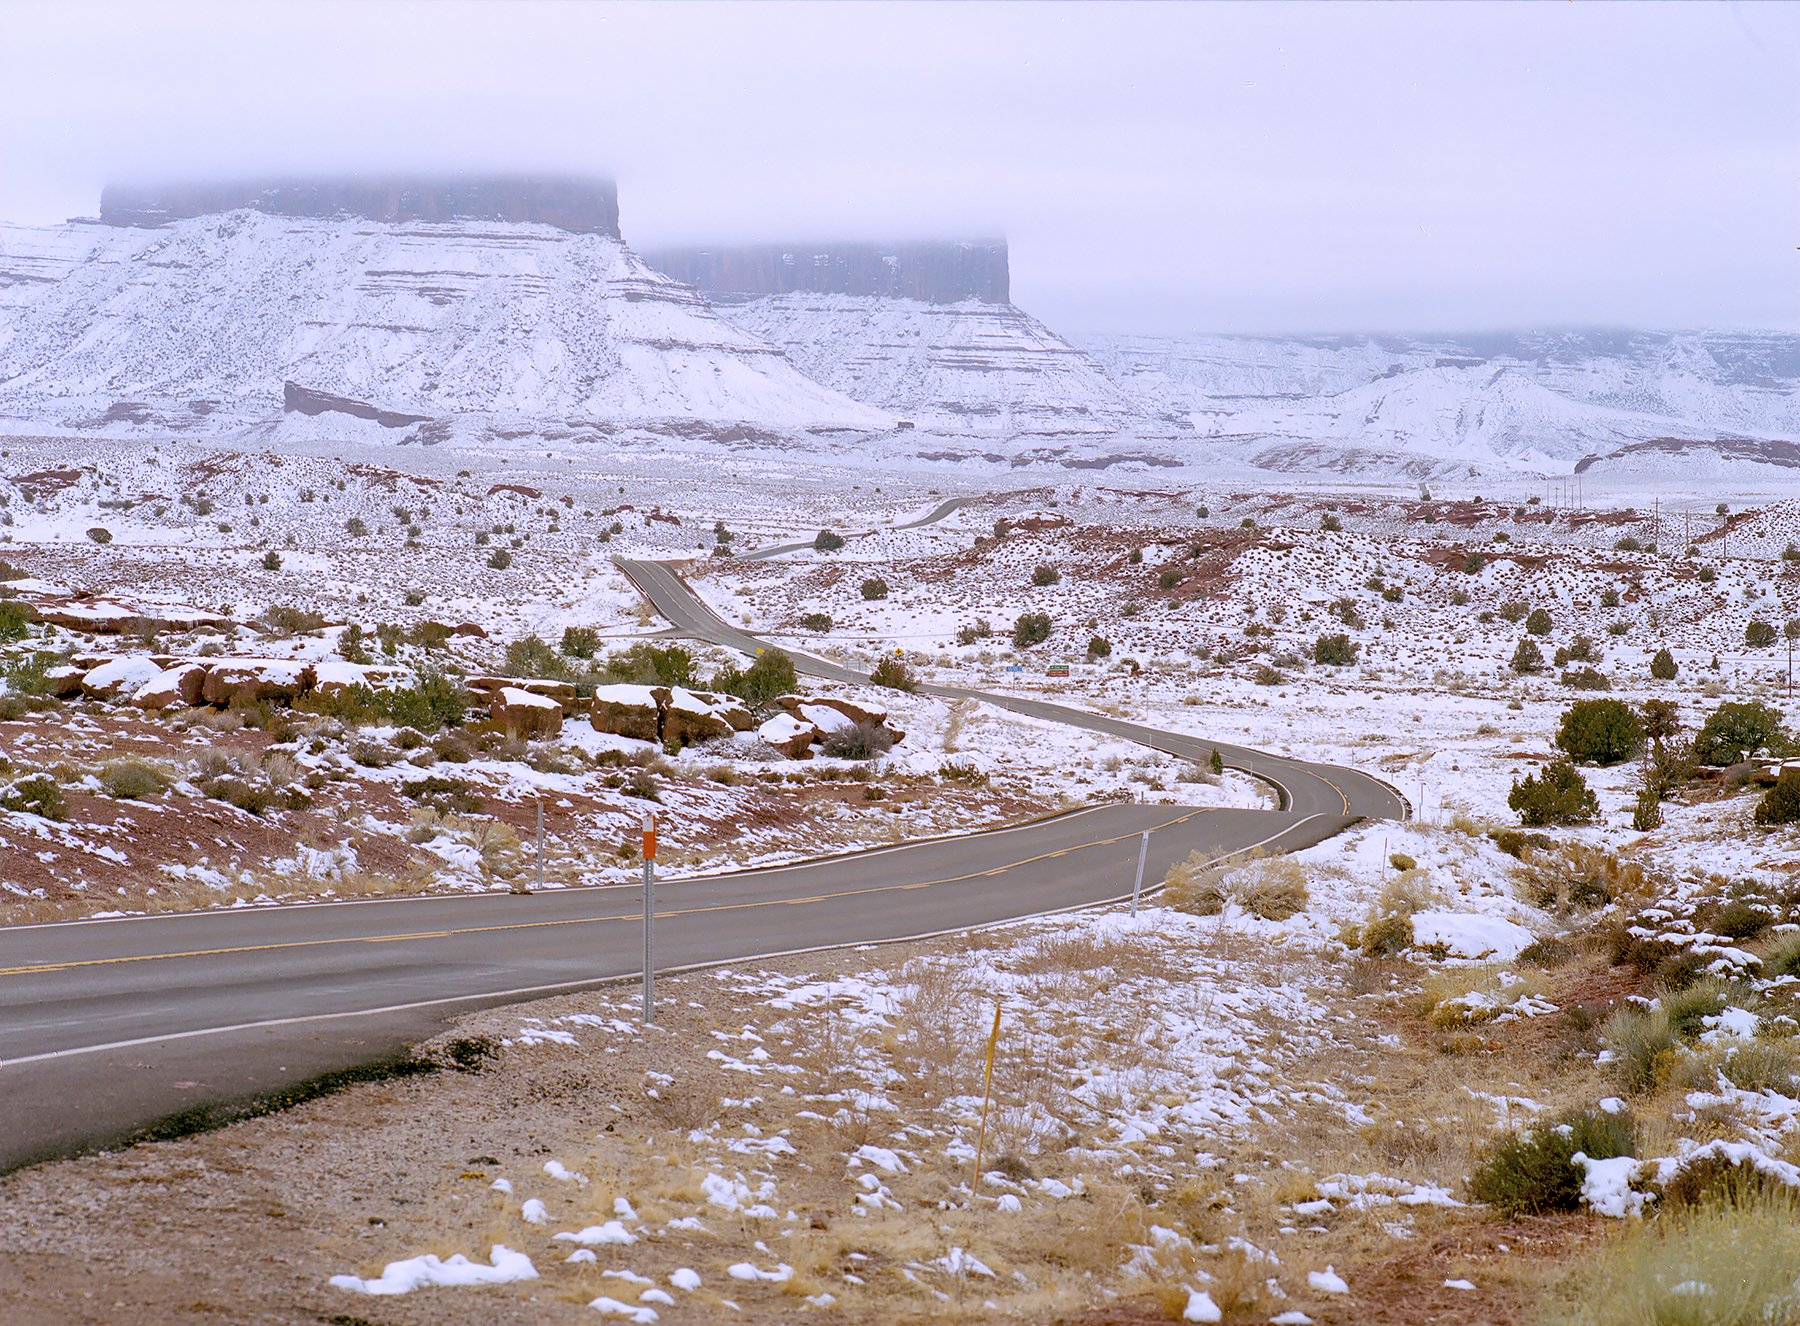 frame 11-Highway 128 along the Colorado River, Canyonlands, Utah